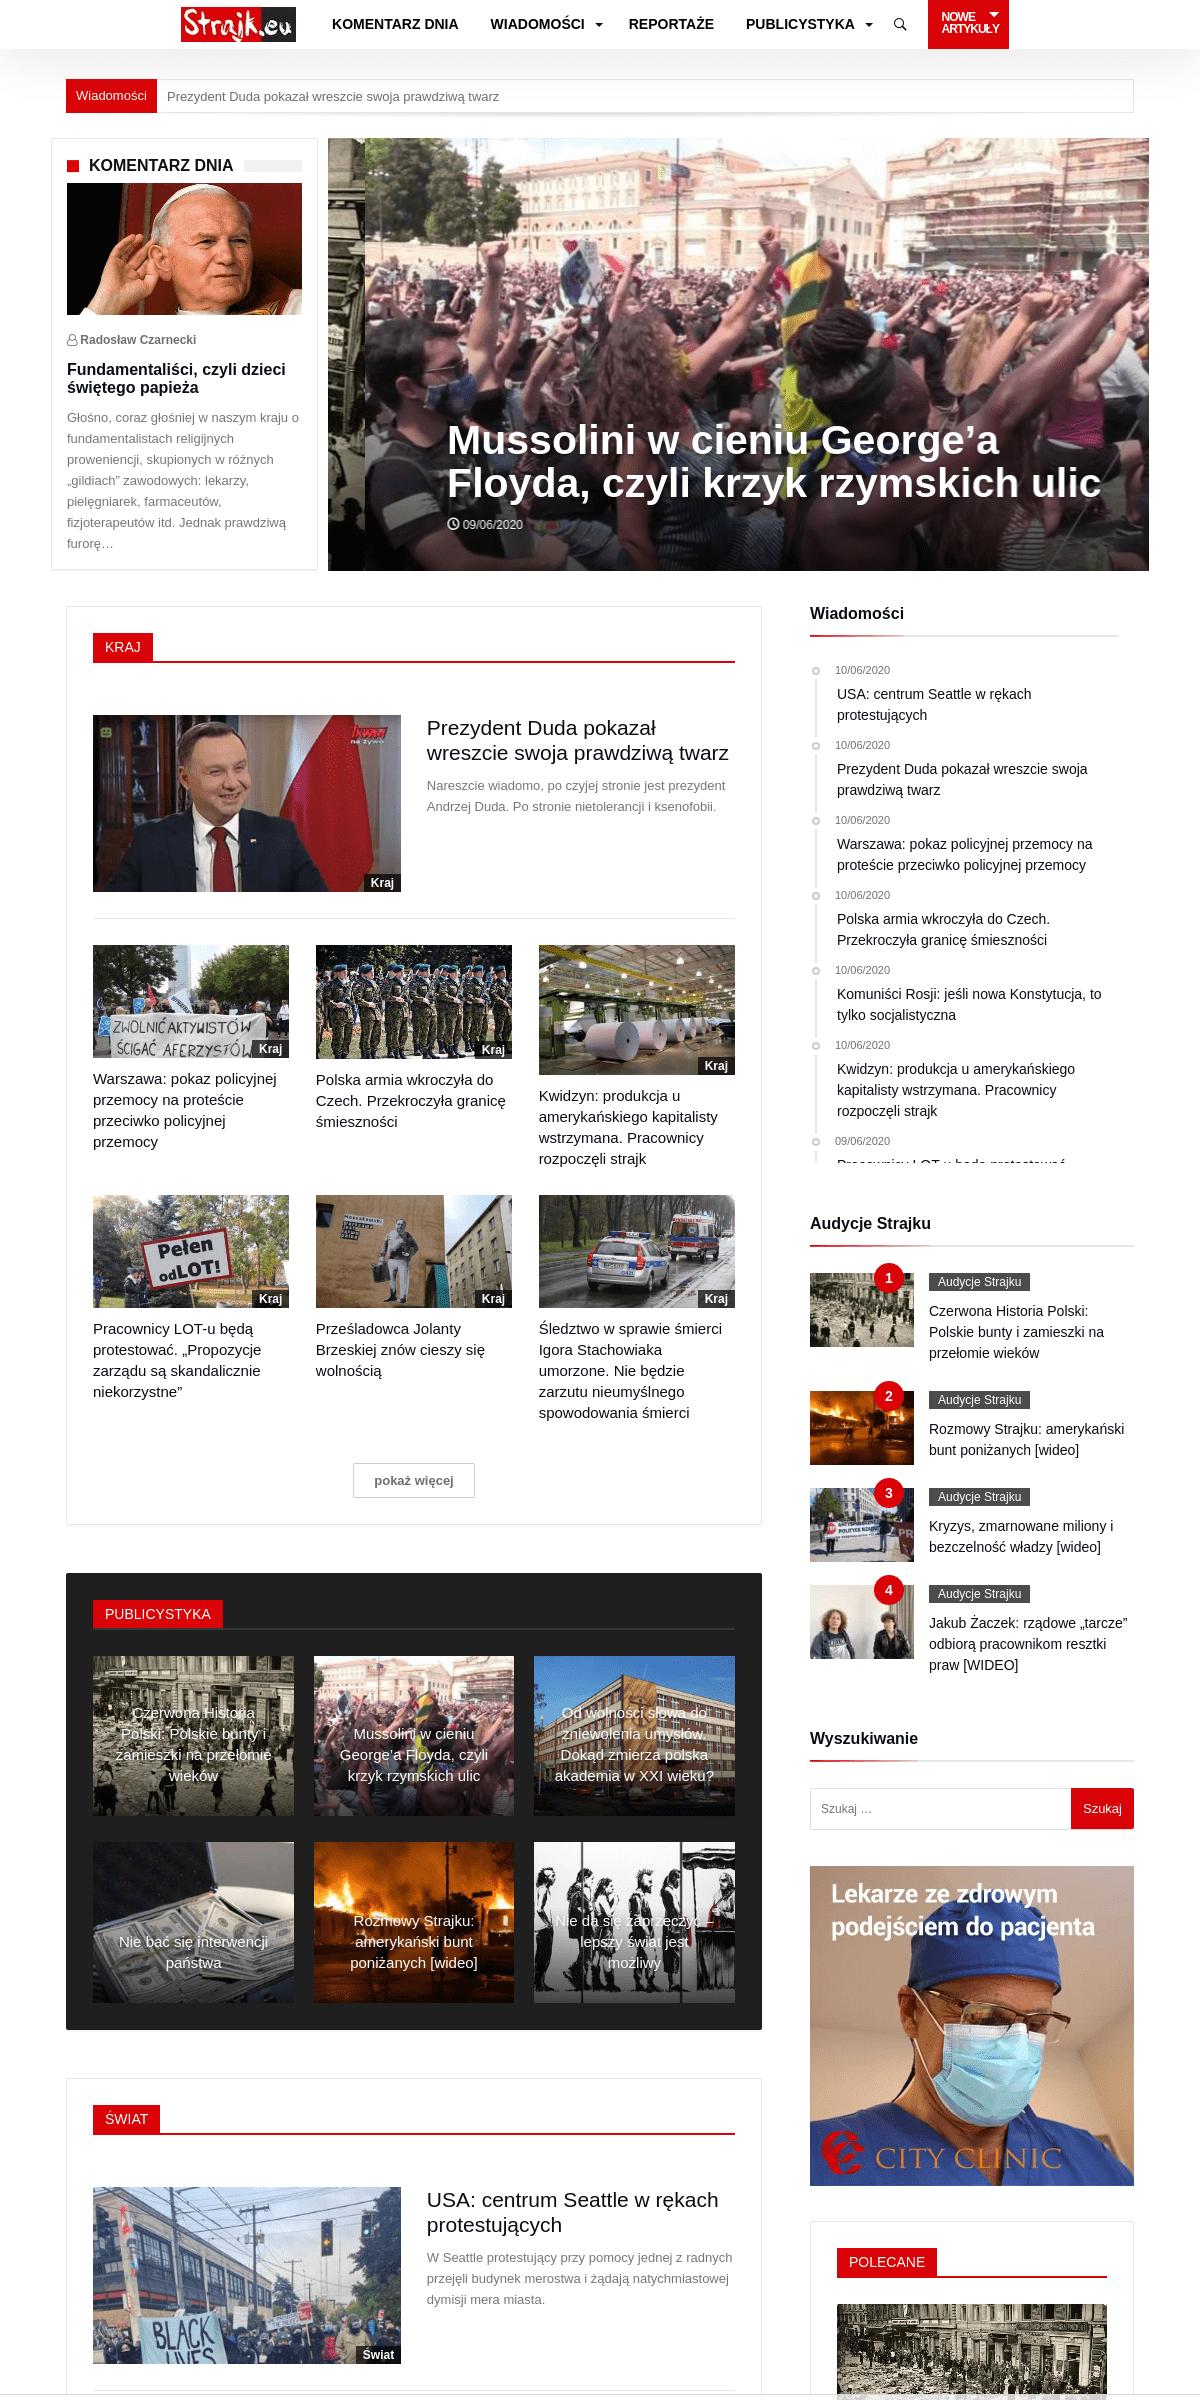 Portal STRAJK